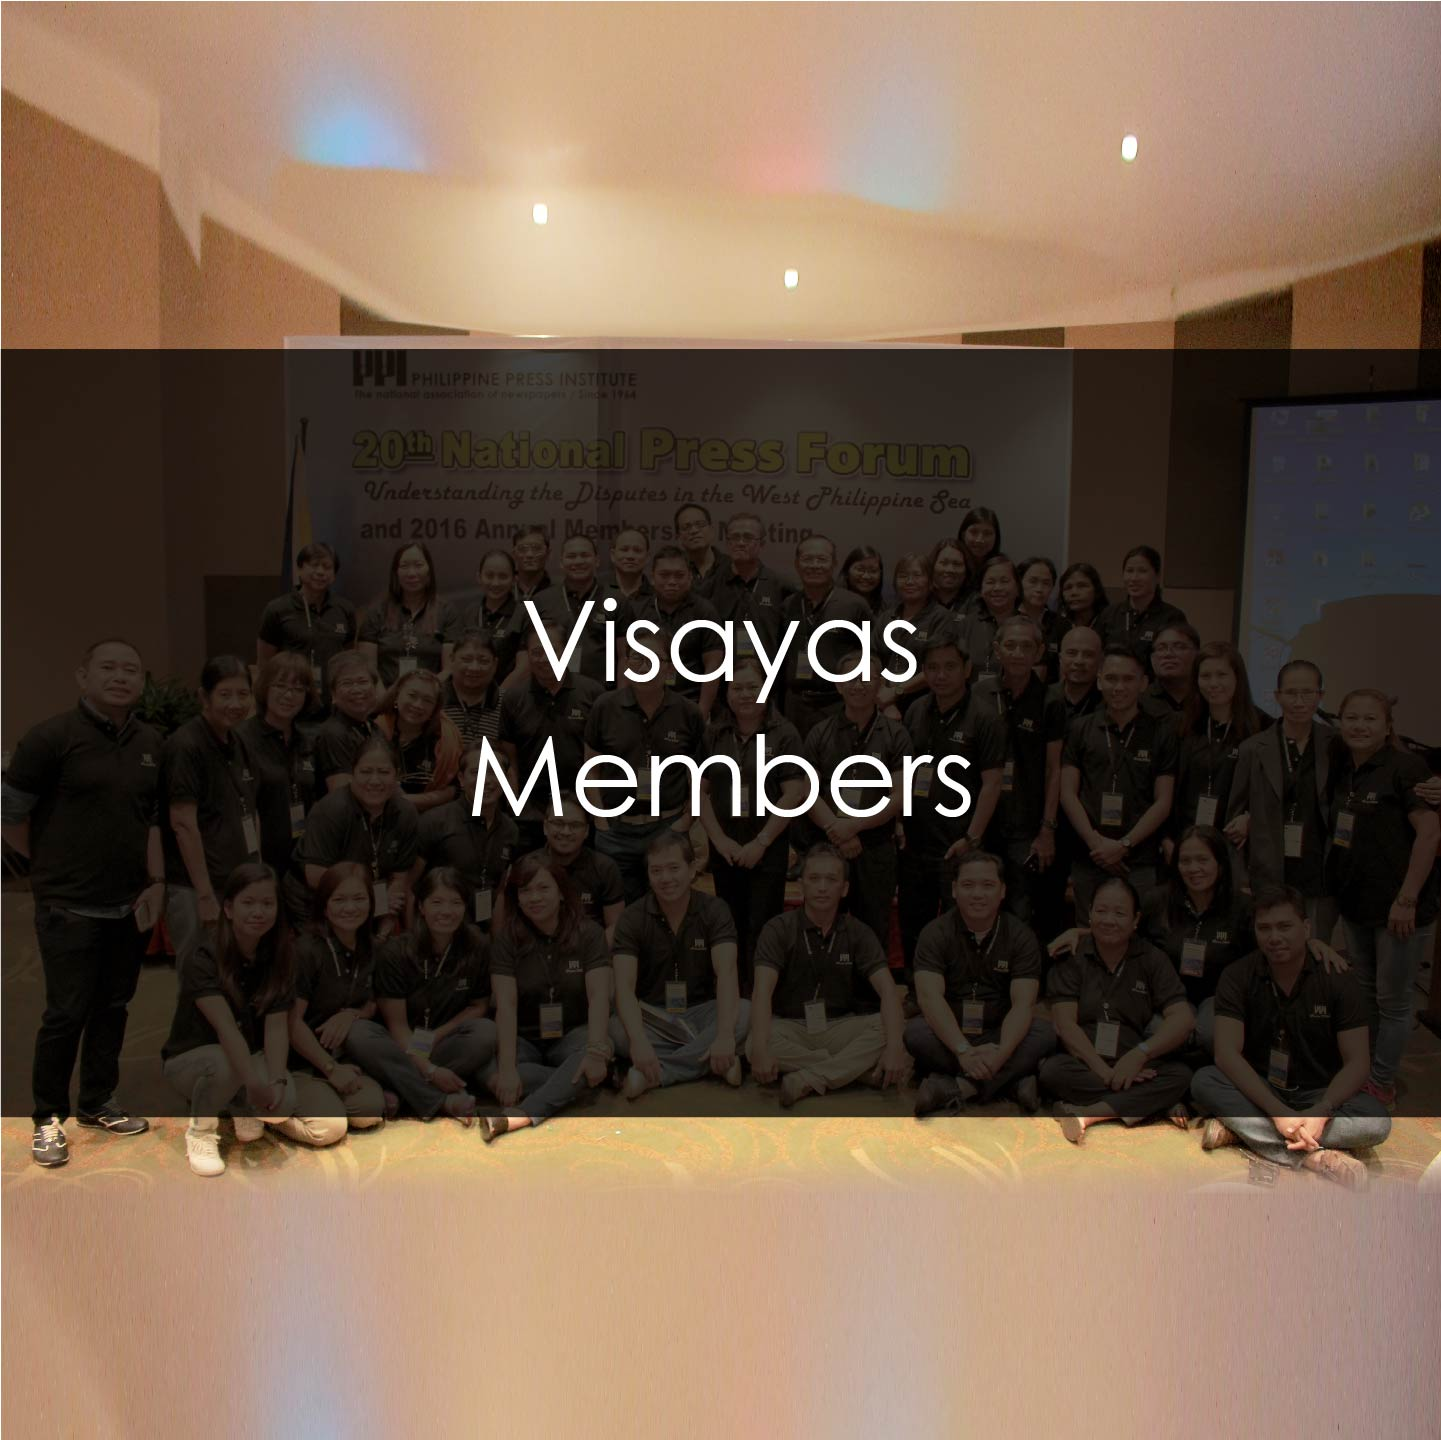 PPI Visayas Members Thumbnail